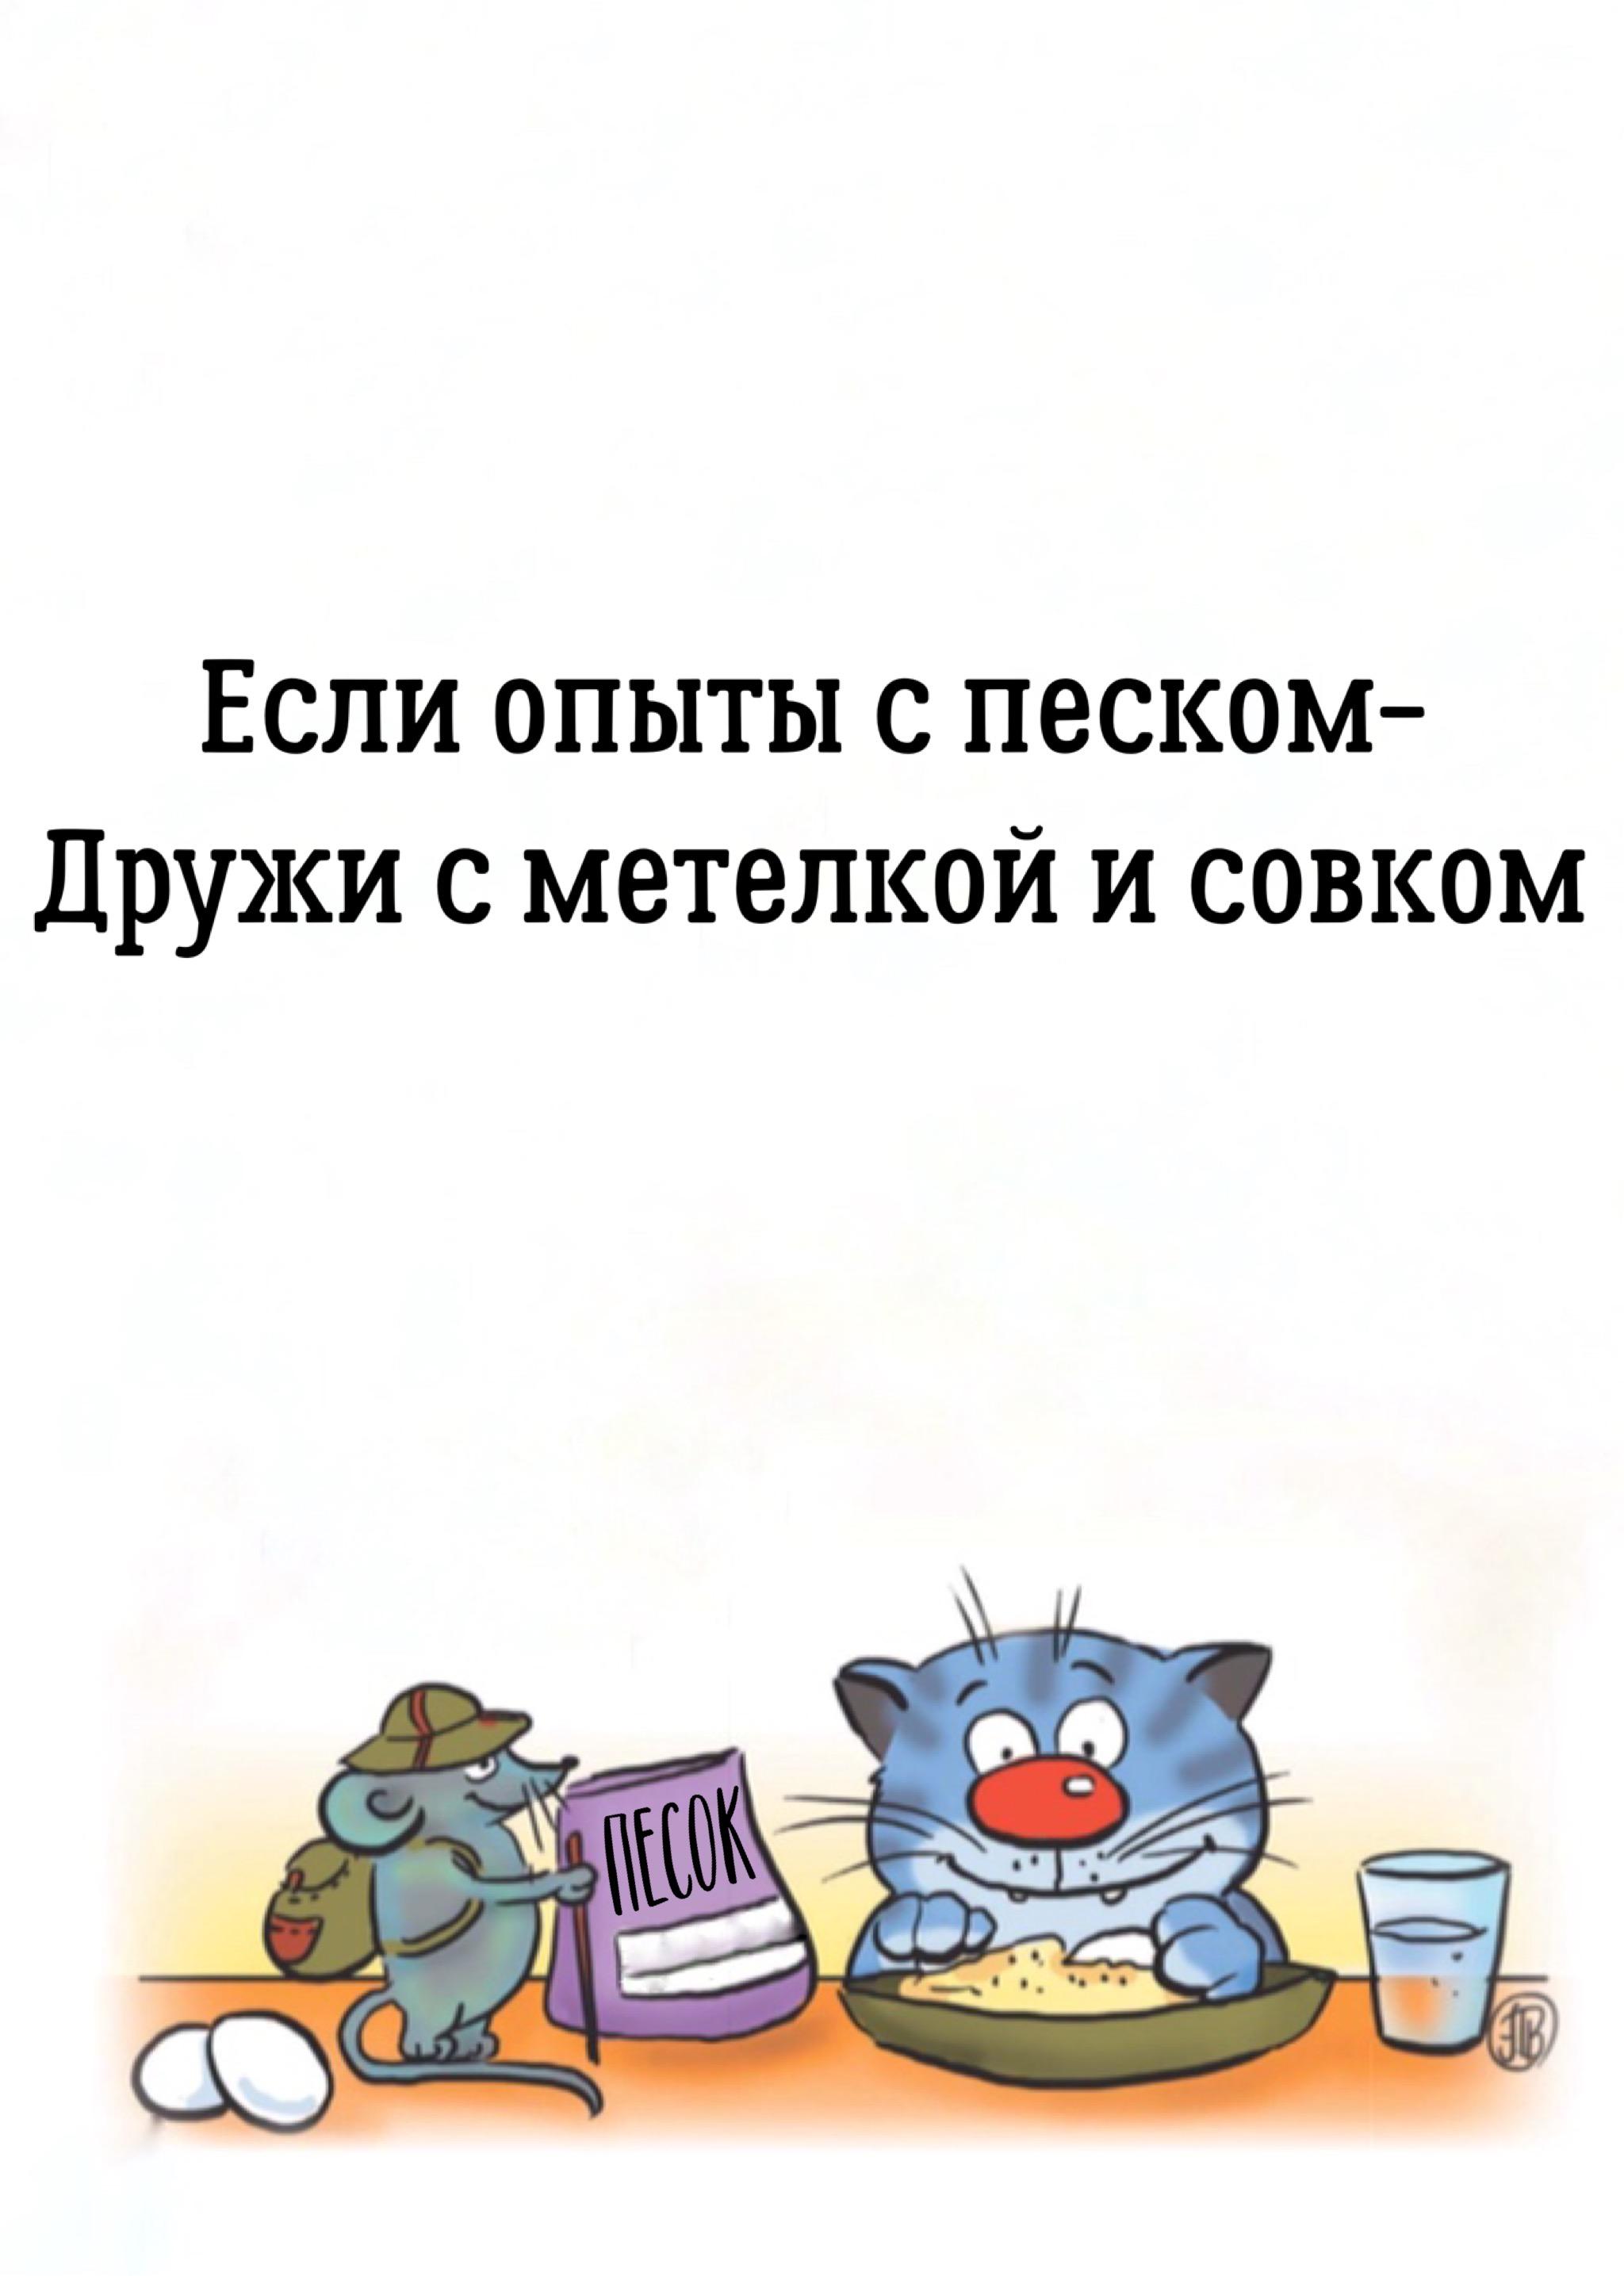 hello_html_2b20ba09.jpg